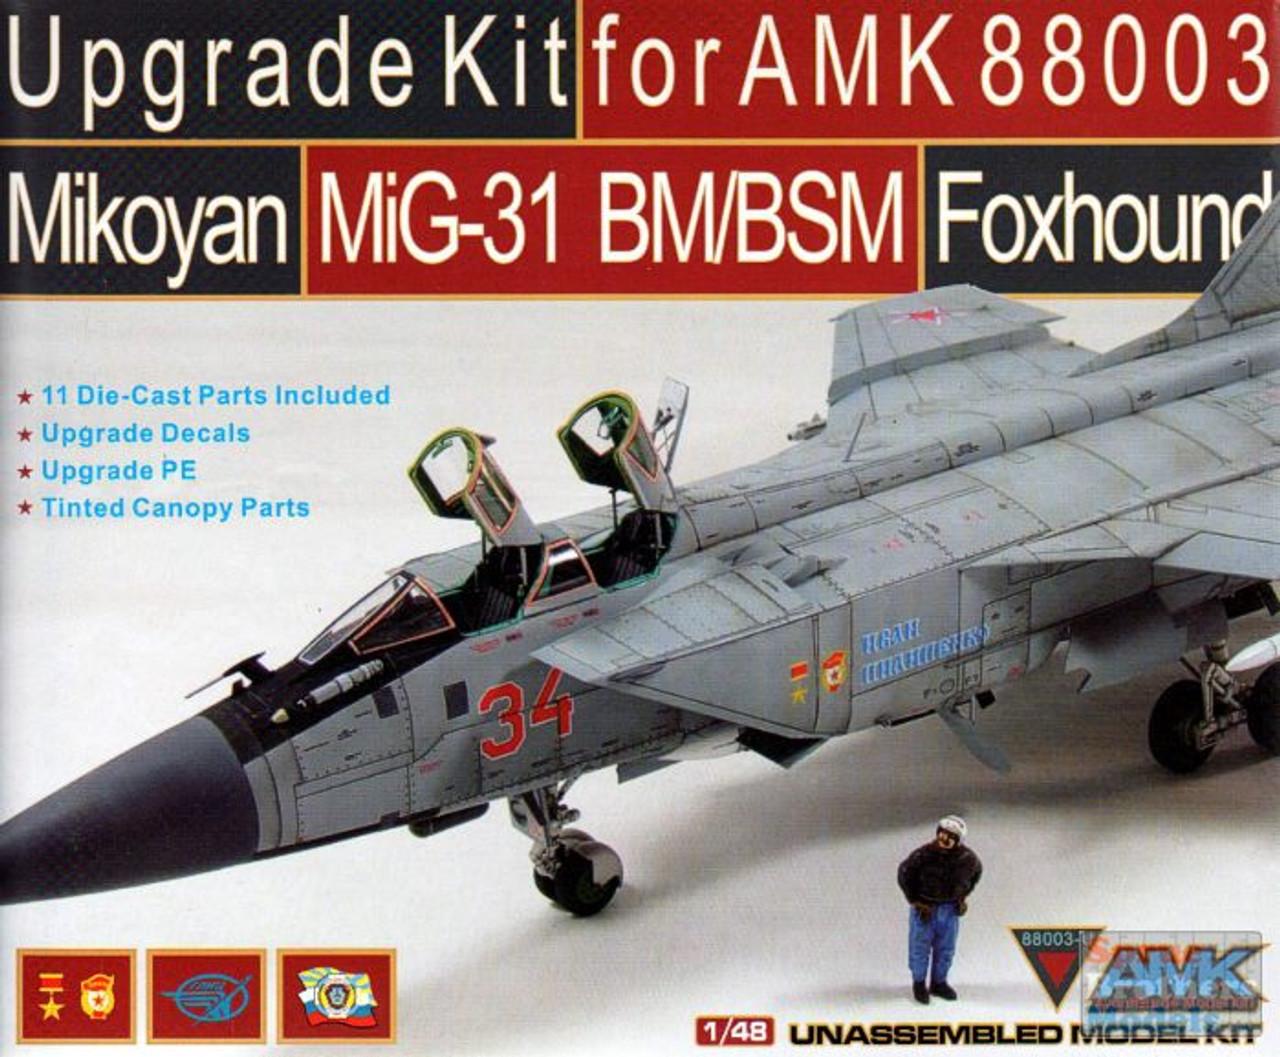 AMK88003-U 1:48 AMK Upgrade Set for MIG-31BM/BSM Foxhound (AMK kit)